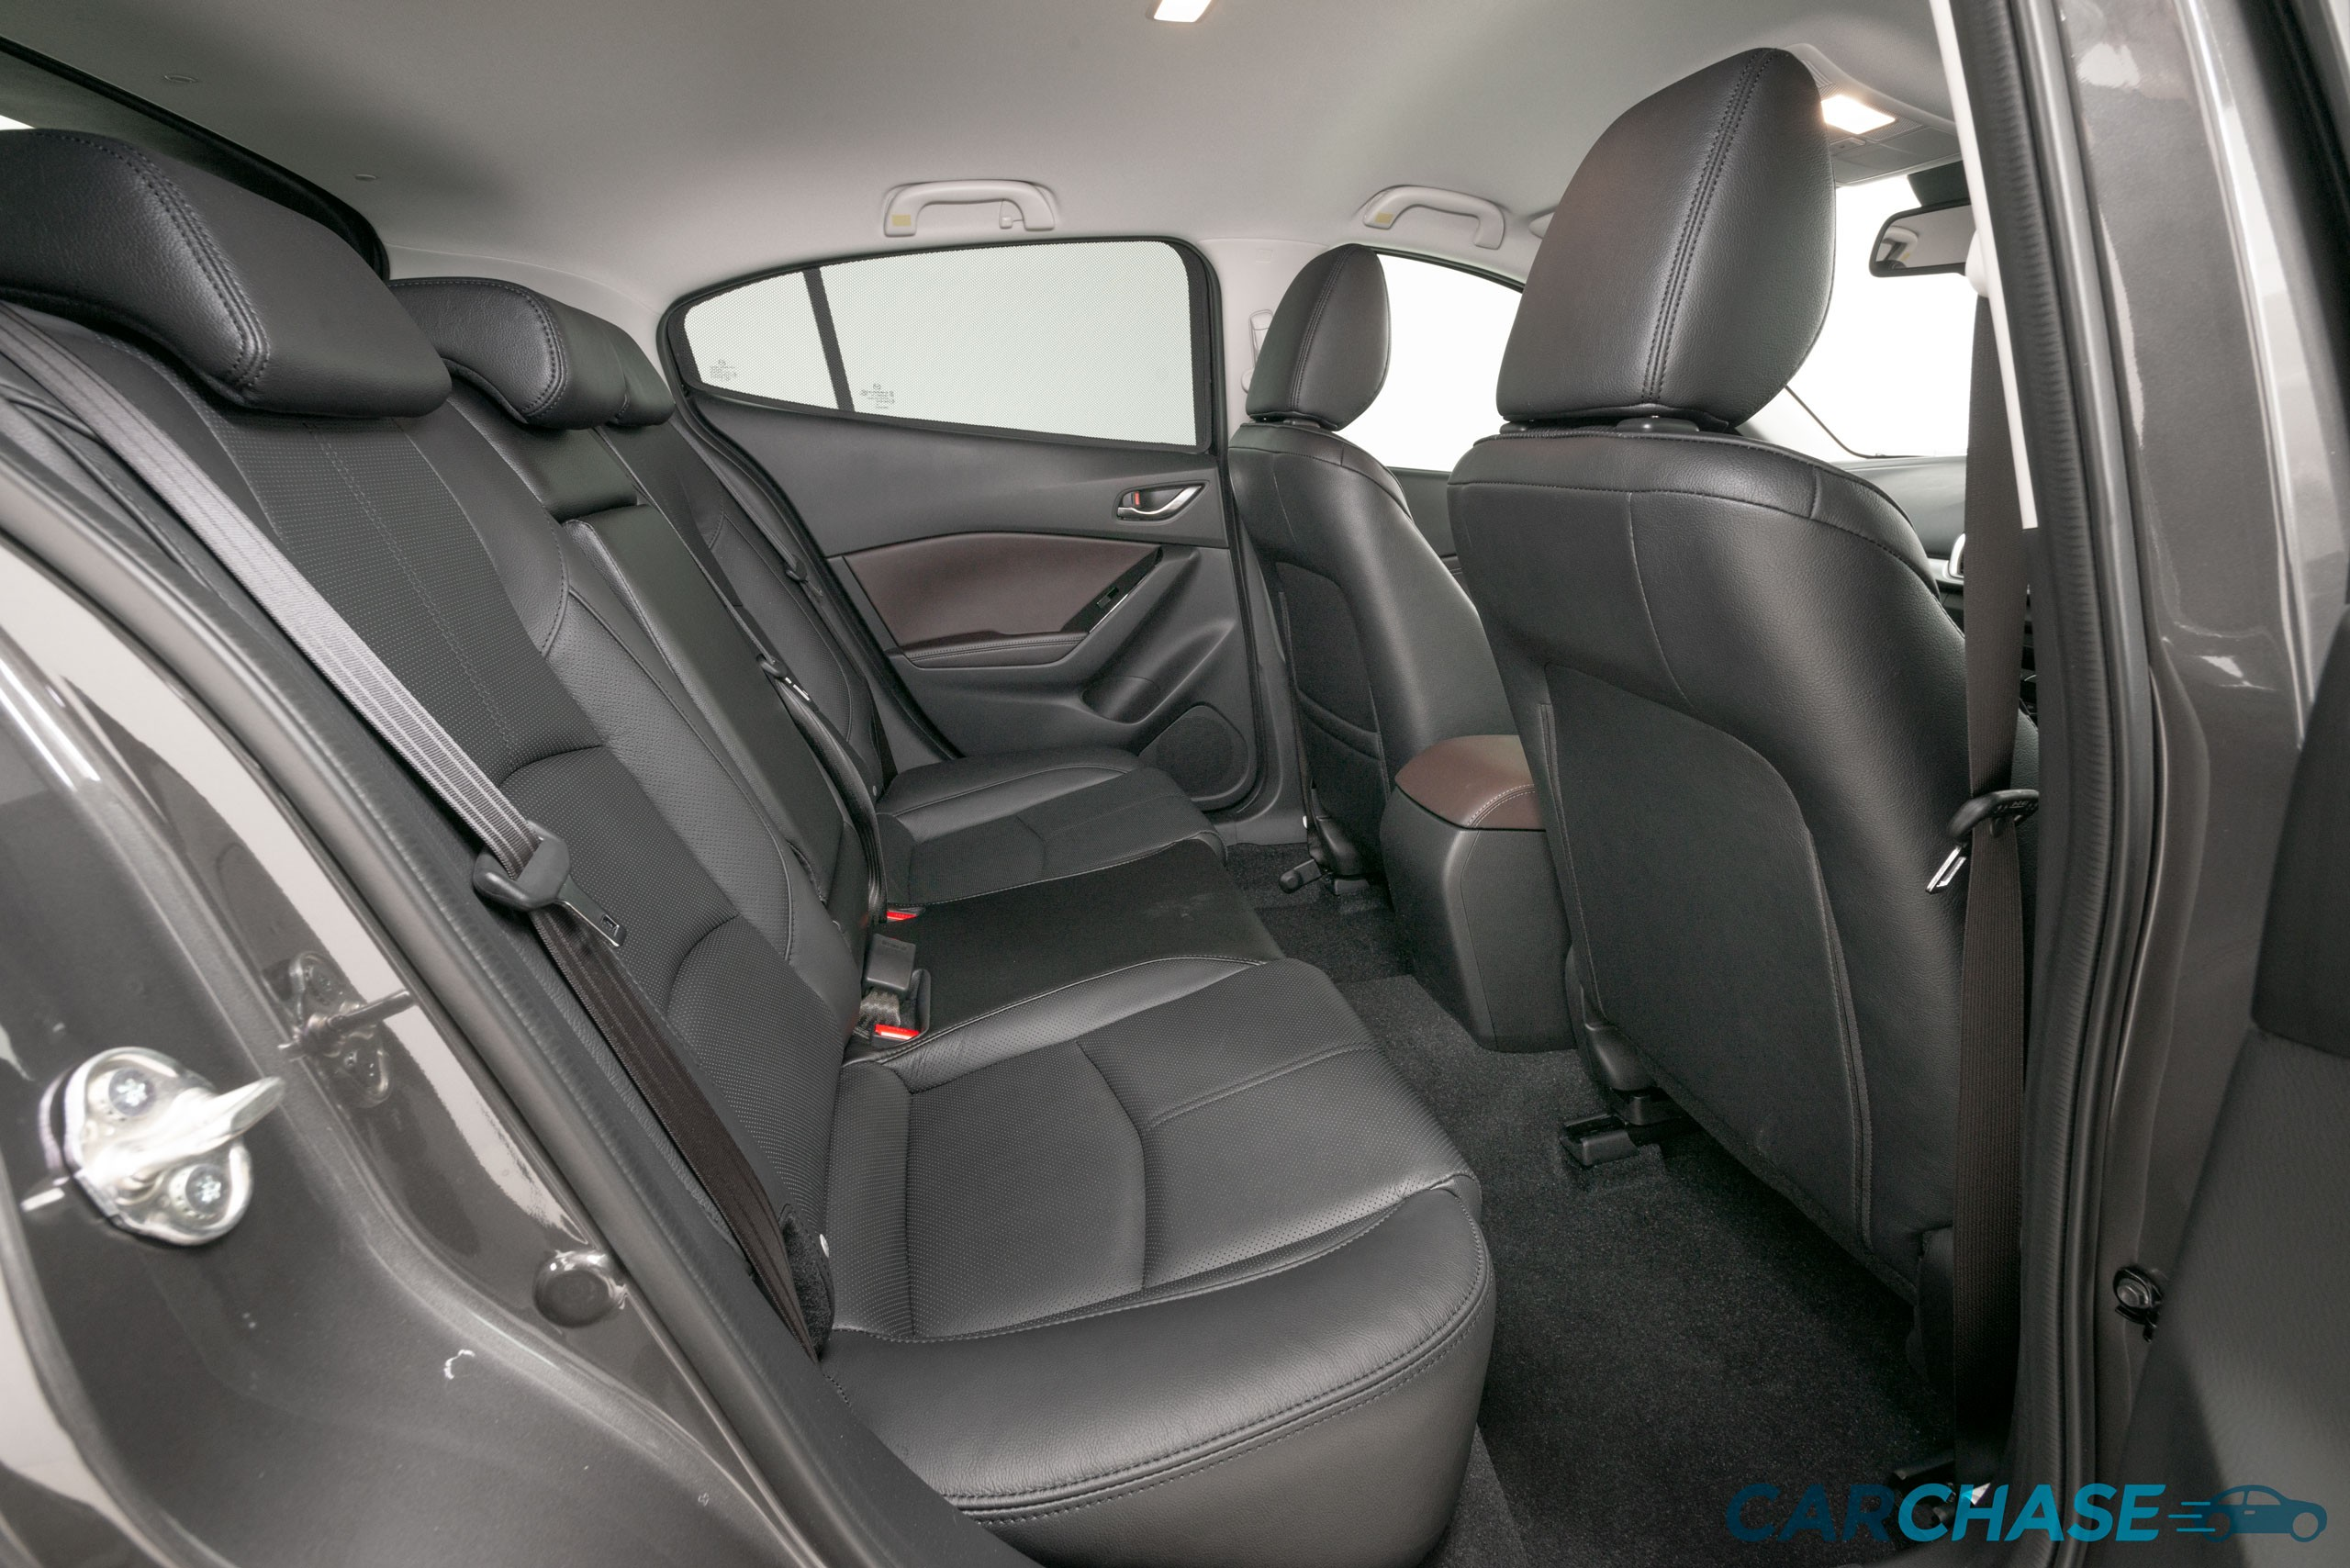 Image 8/10 of 2018 Mazda 3 Touring